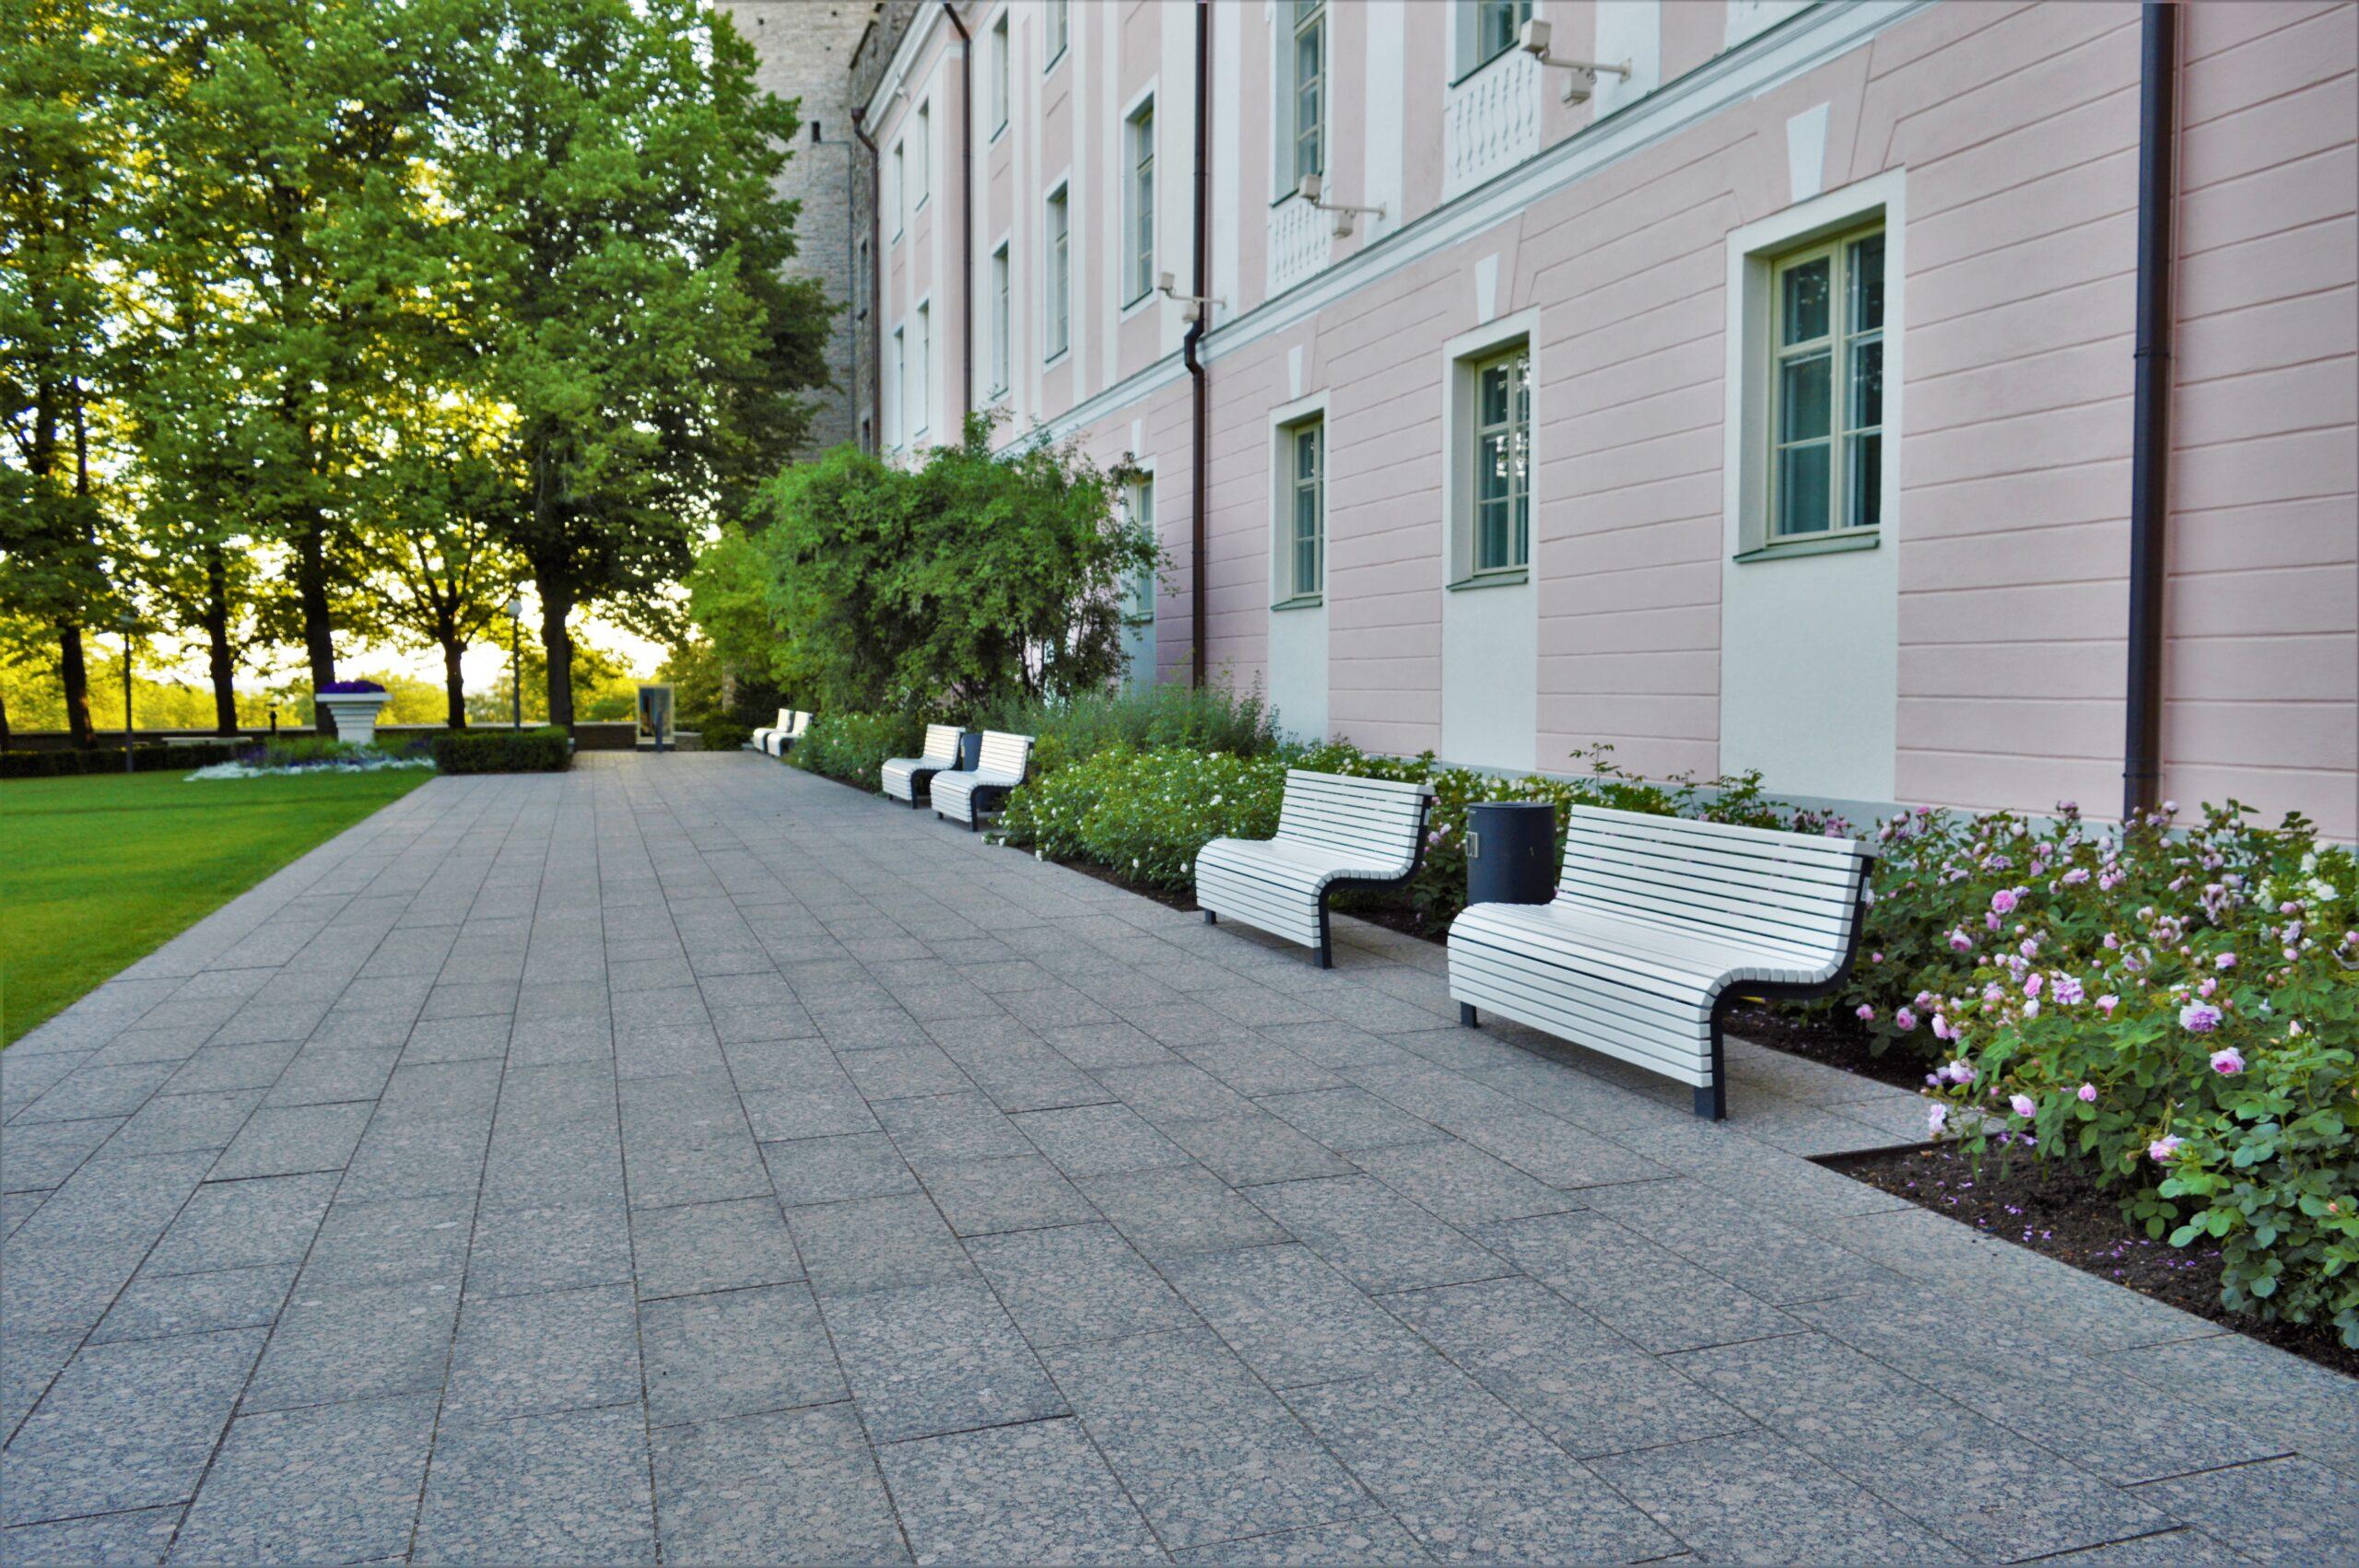 park bench Voog